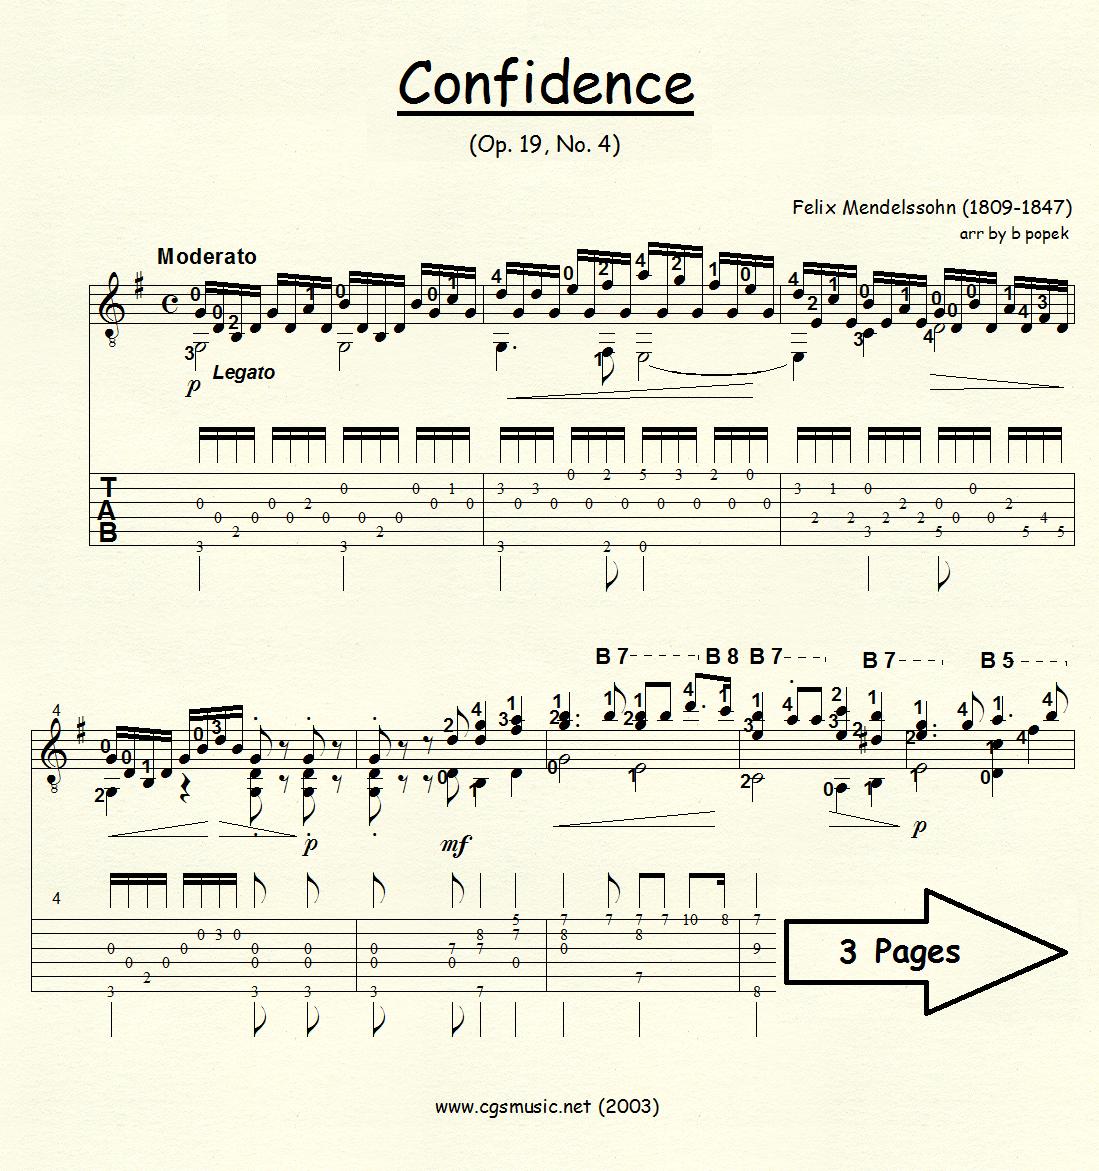 Confidence (Mendelssohn) for Classical Guitar in Tablature